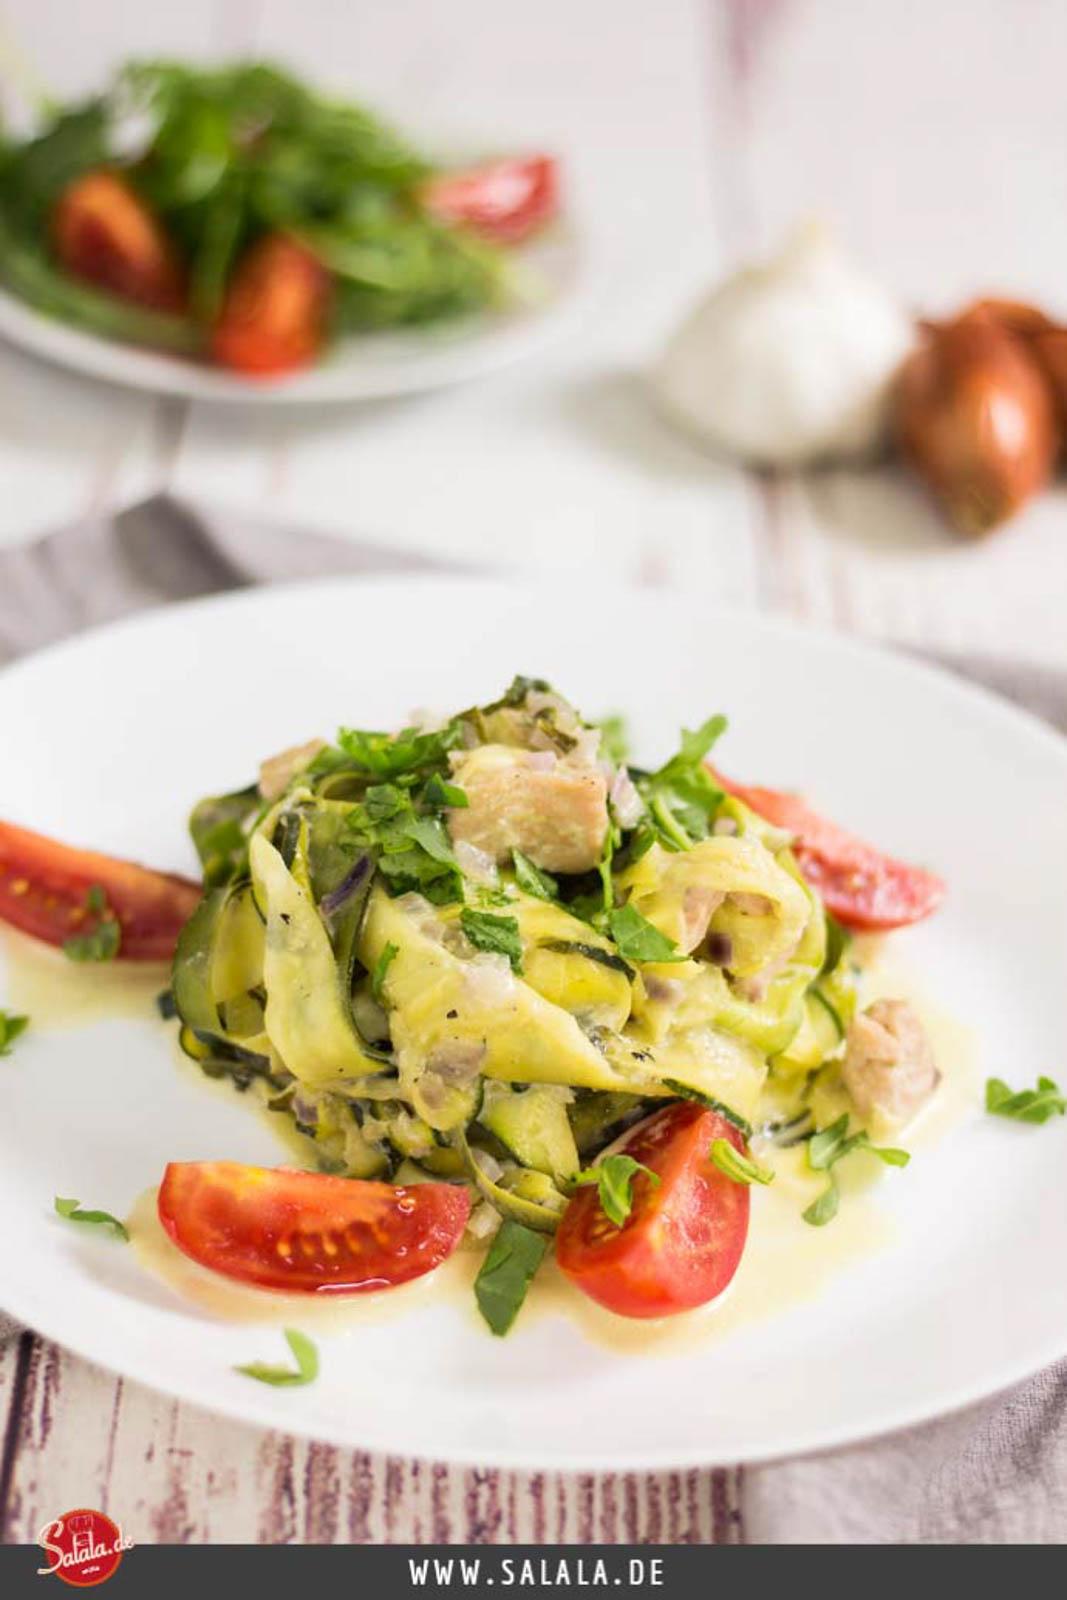 Zucchini Lachs Zudeln - by salala.de - Rezept mit Gemüsenudeln Low Carb Zucchininudeln mit Lachs #lachszucchinipfanne #gemüsenudeln #zucchninudeln #lowcarb #rezepte #lowcarbrezepte